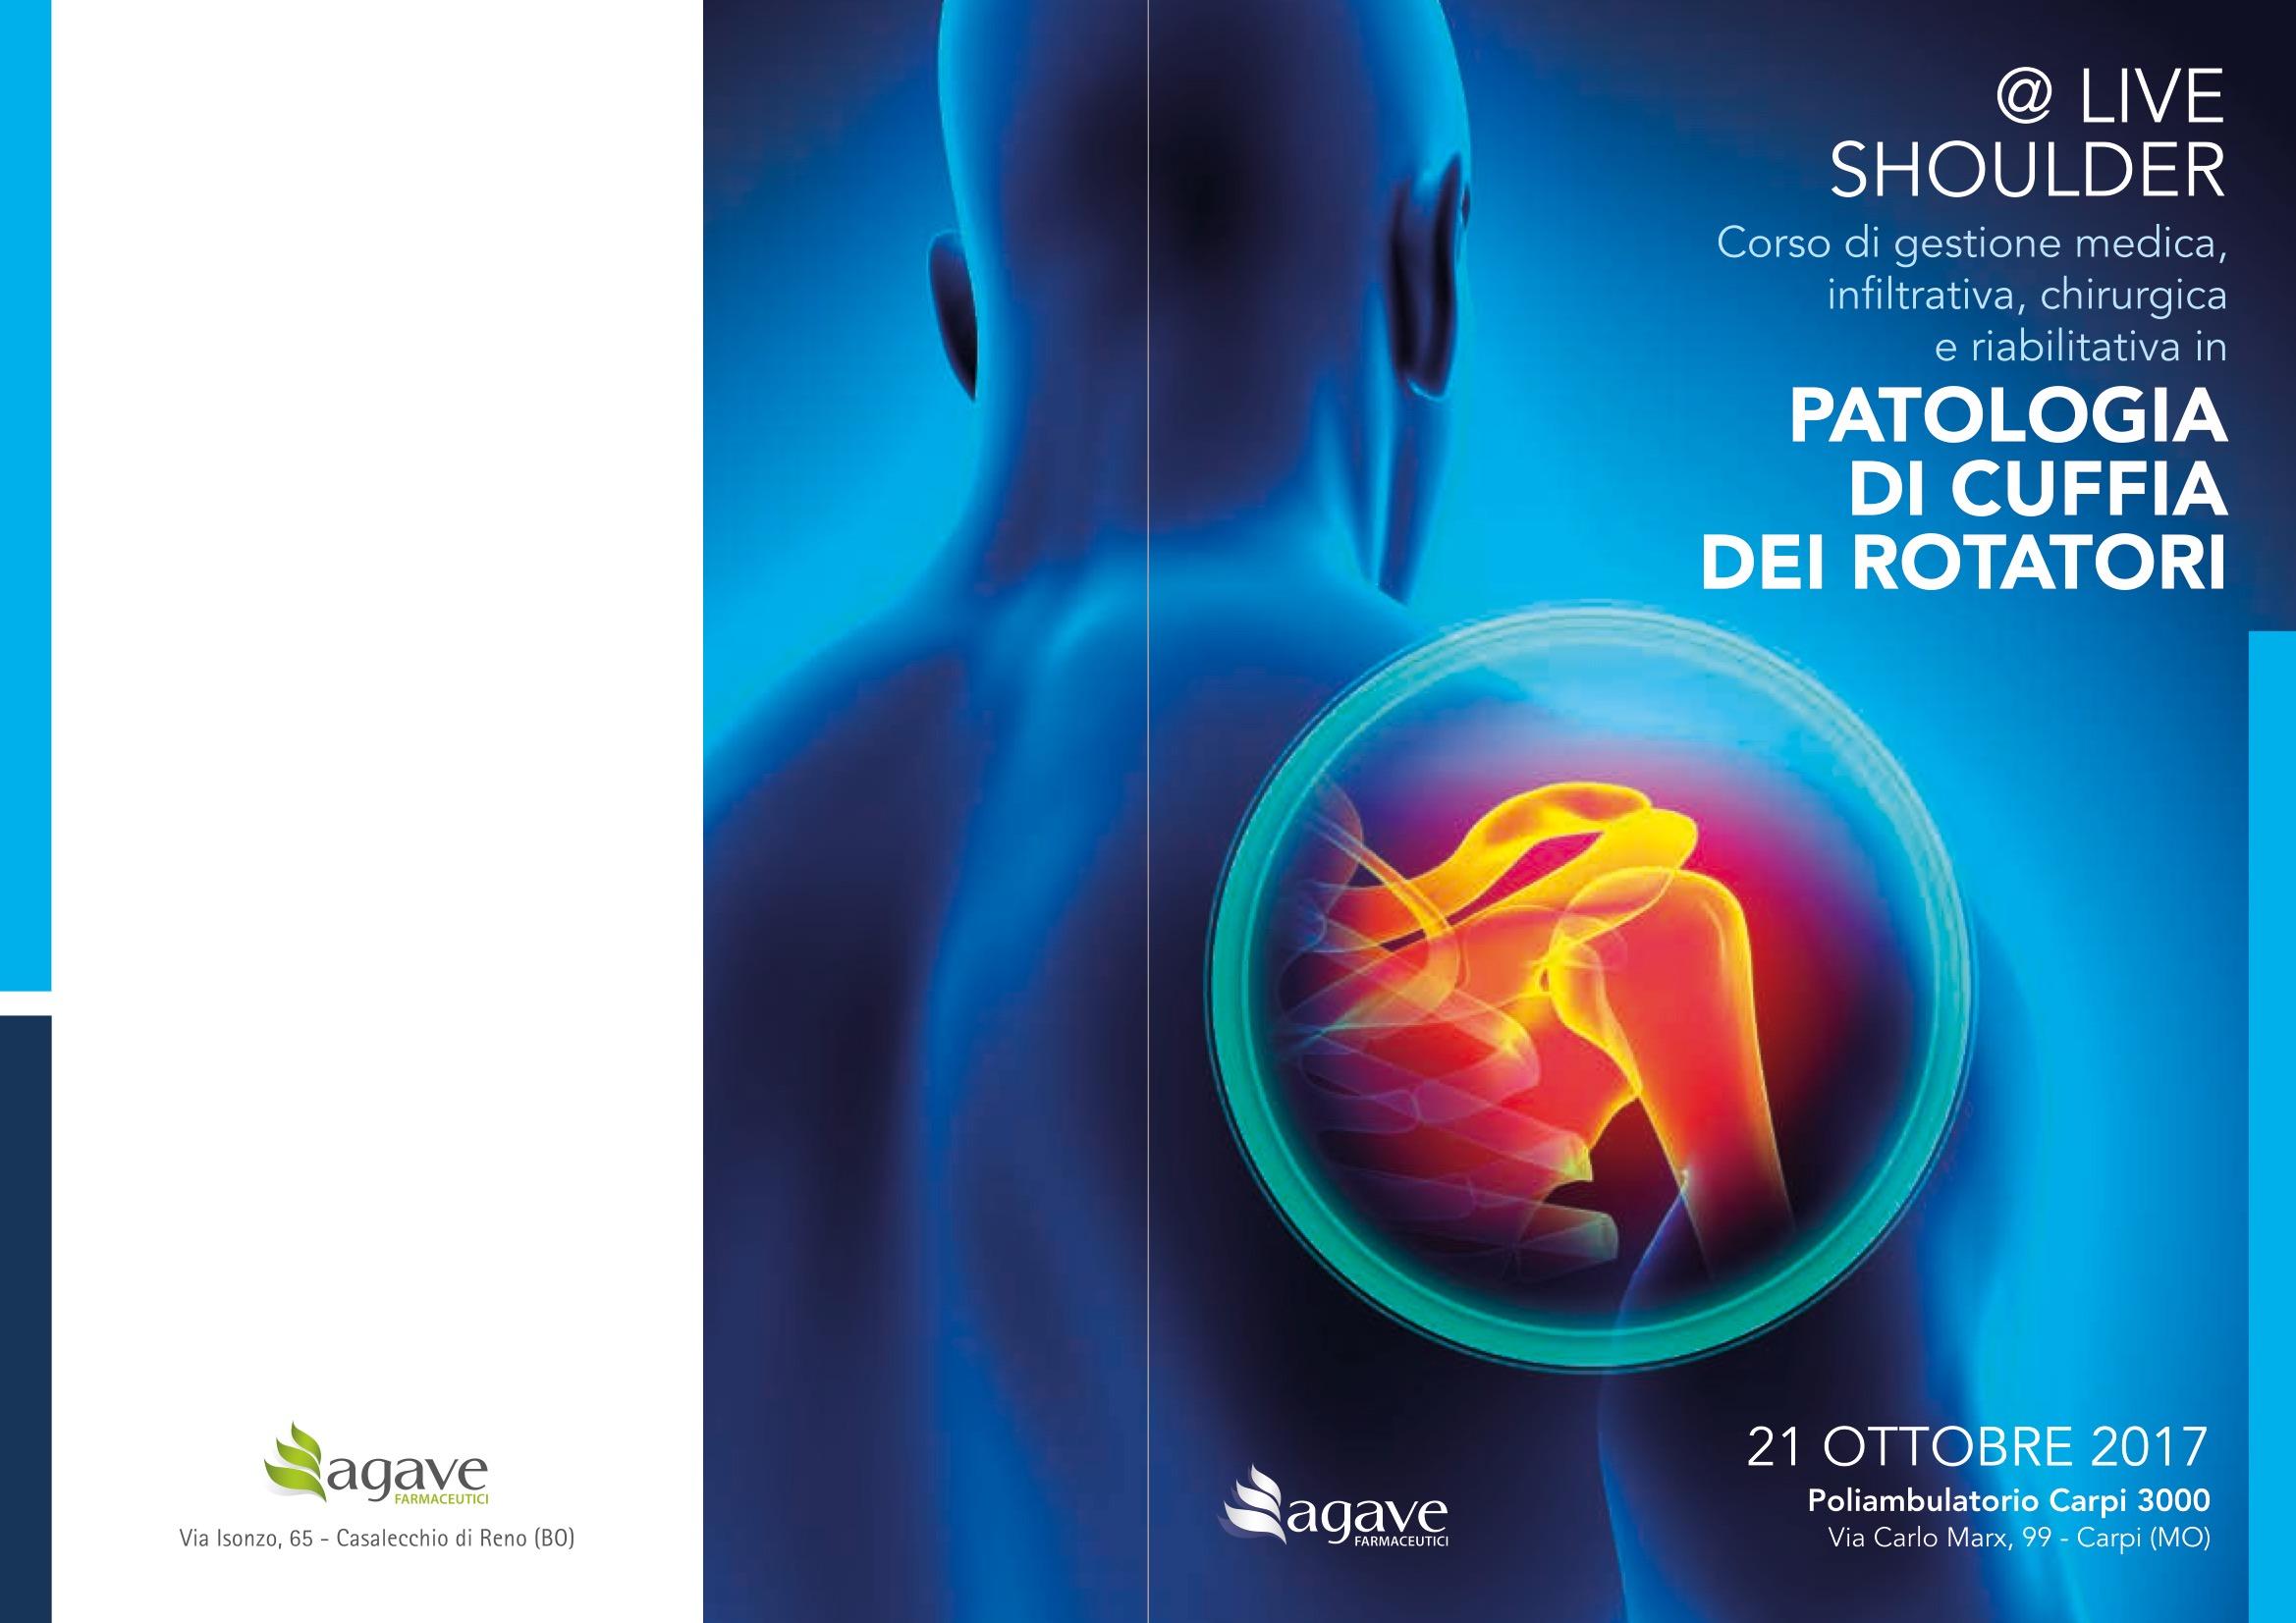 @ LIVE SHOULDER – PATOLOGIA Di CUFFIA Dei ROTATORI